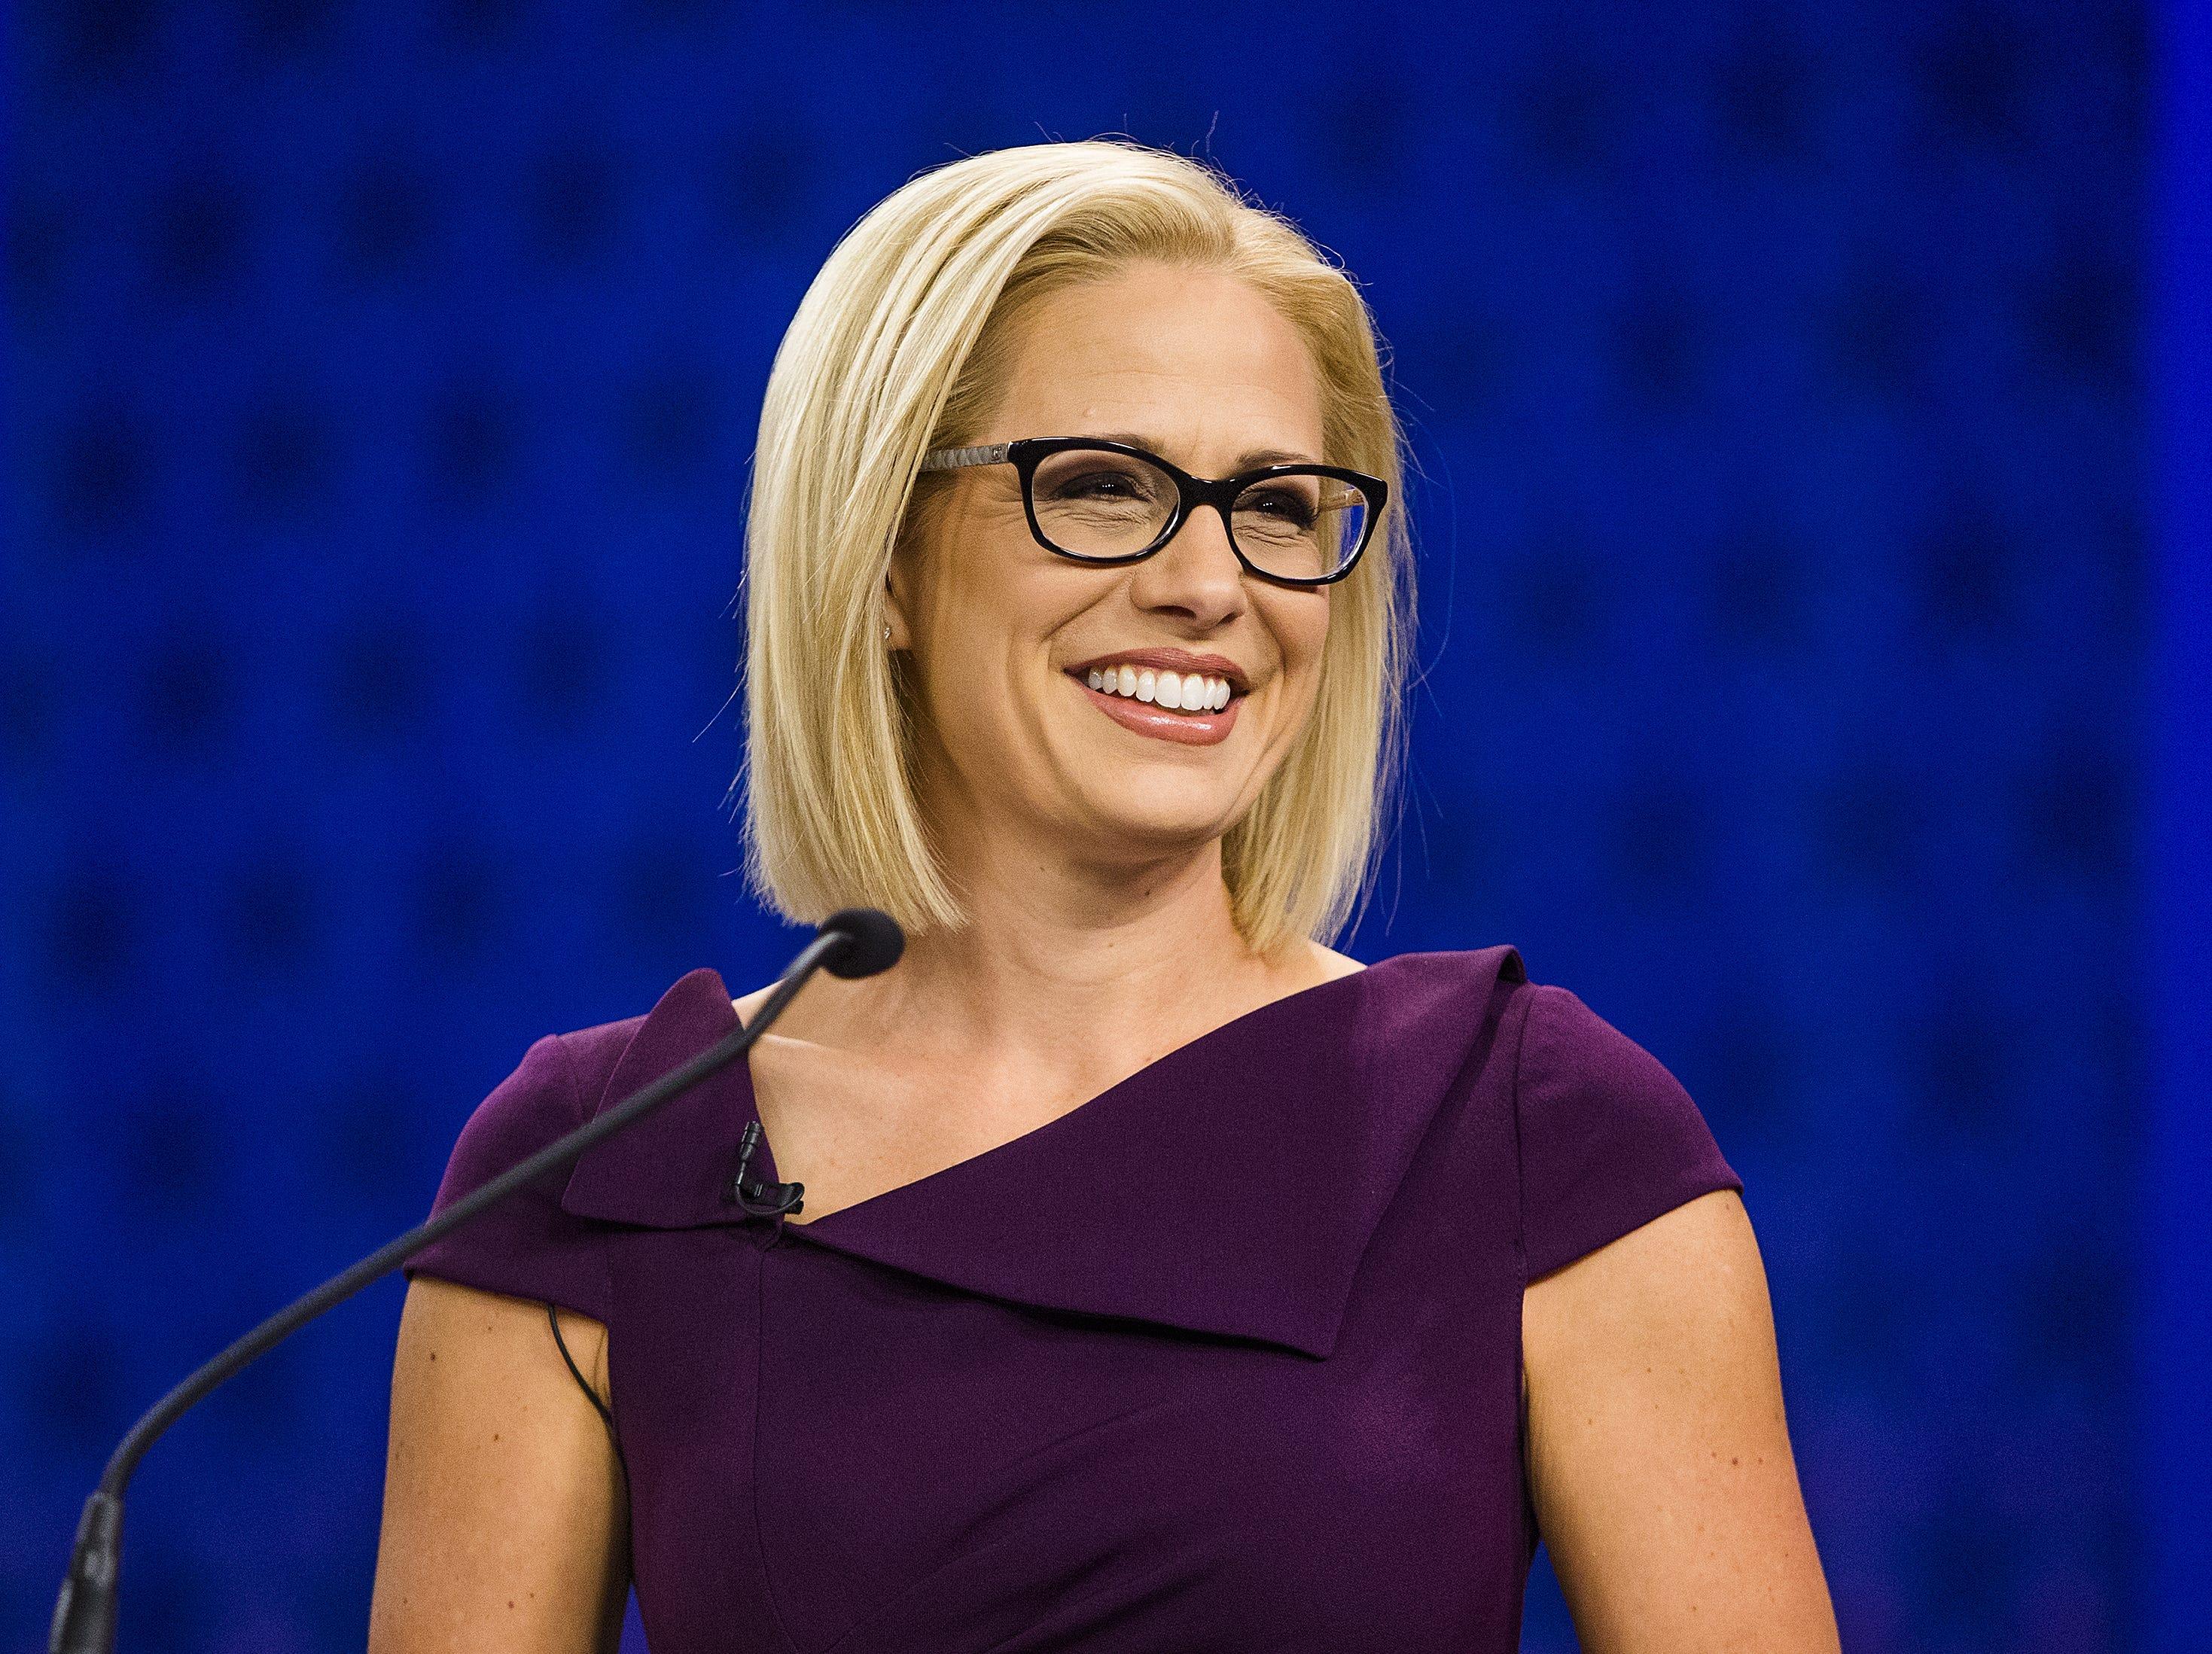 Rep. Kyrsten Sinema prepares to debate Rep. Martha McSally in the Arizona PBS studios at the Walter Cronkite School of Journalism and Mass Communication at Arizona State University in Phoenix on Oct. 15, 2018.